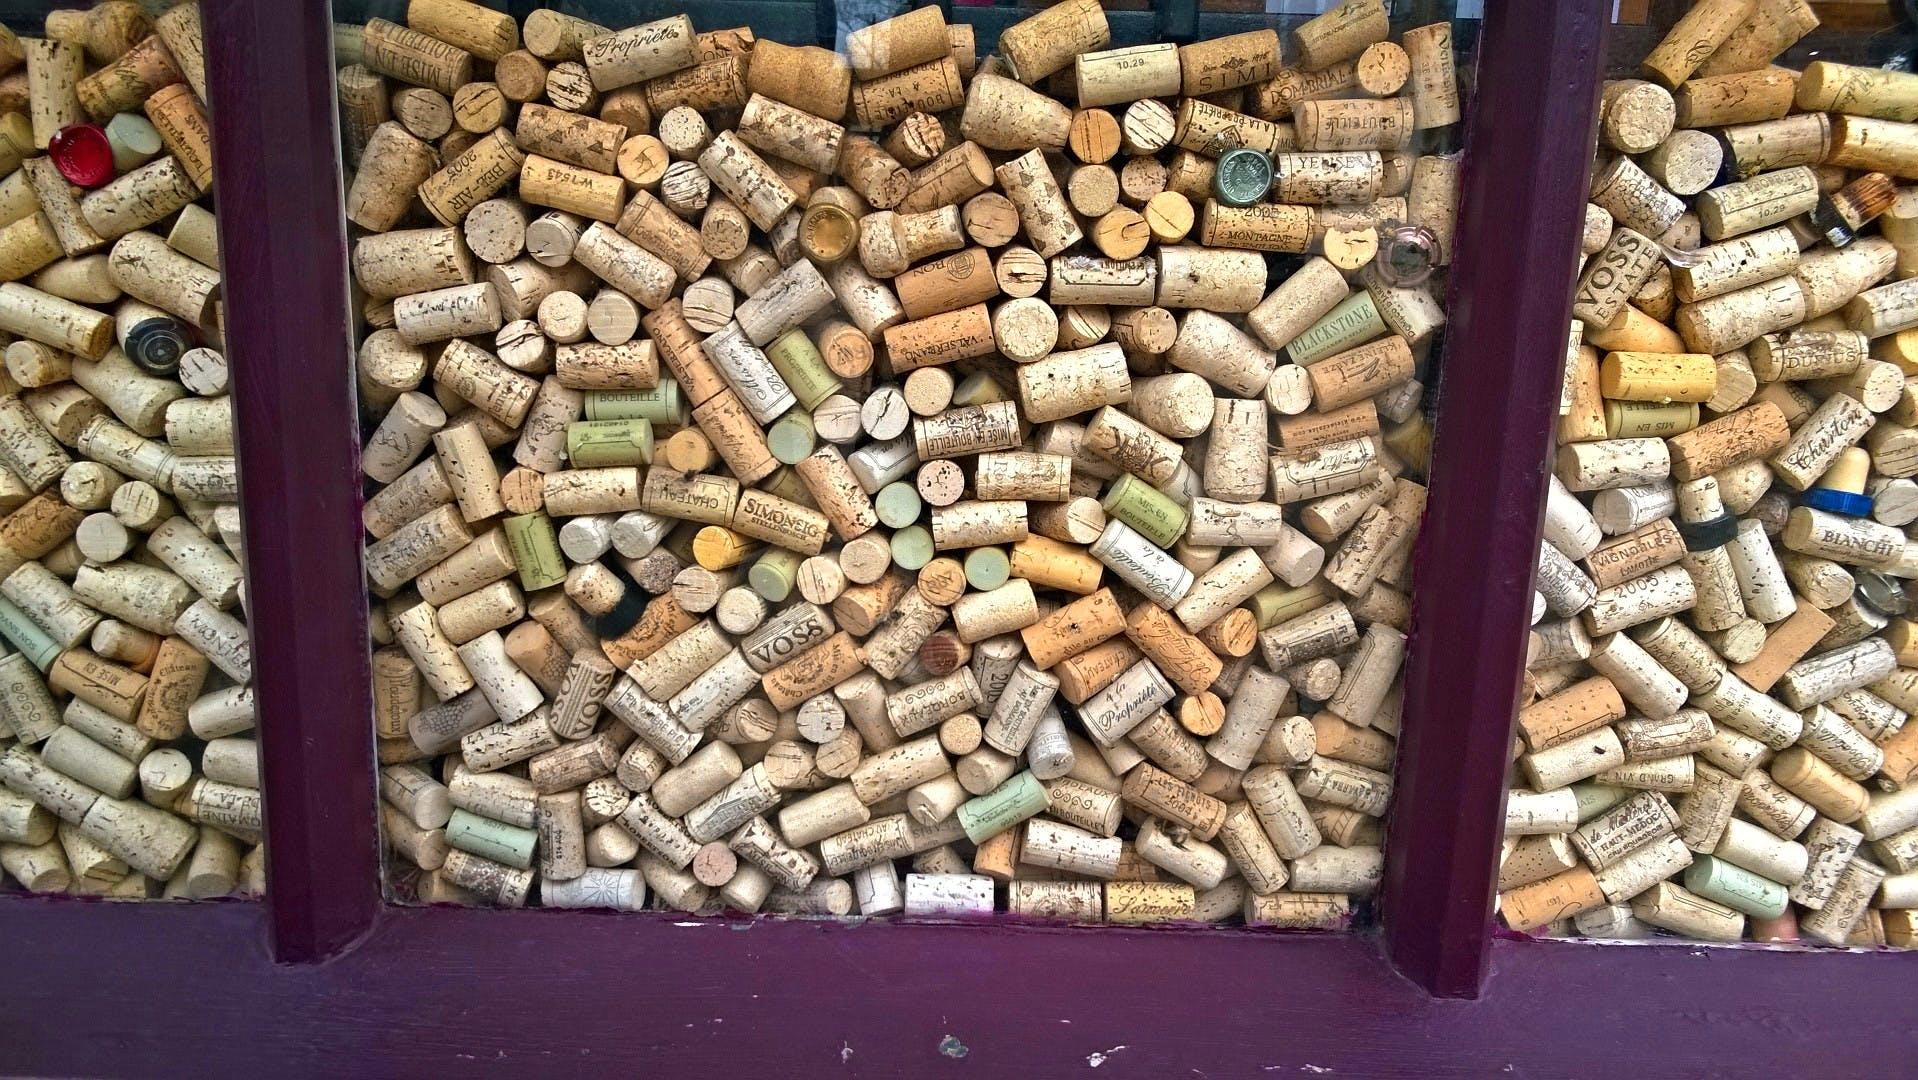 Free stock photo of #corcks